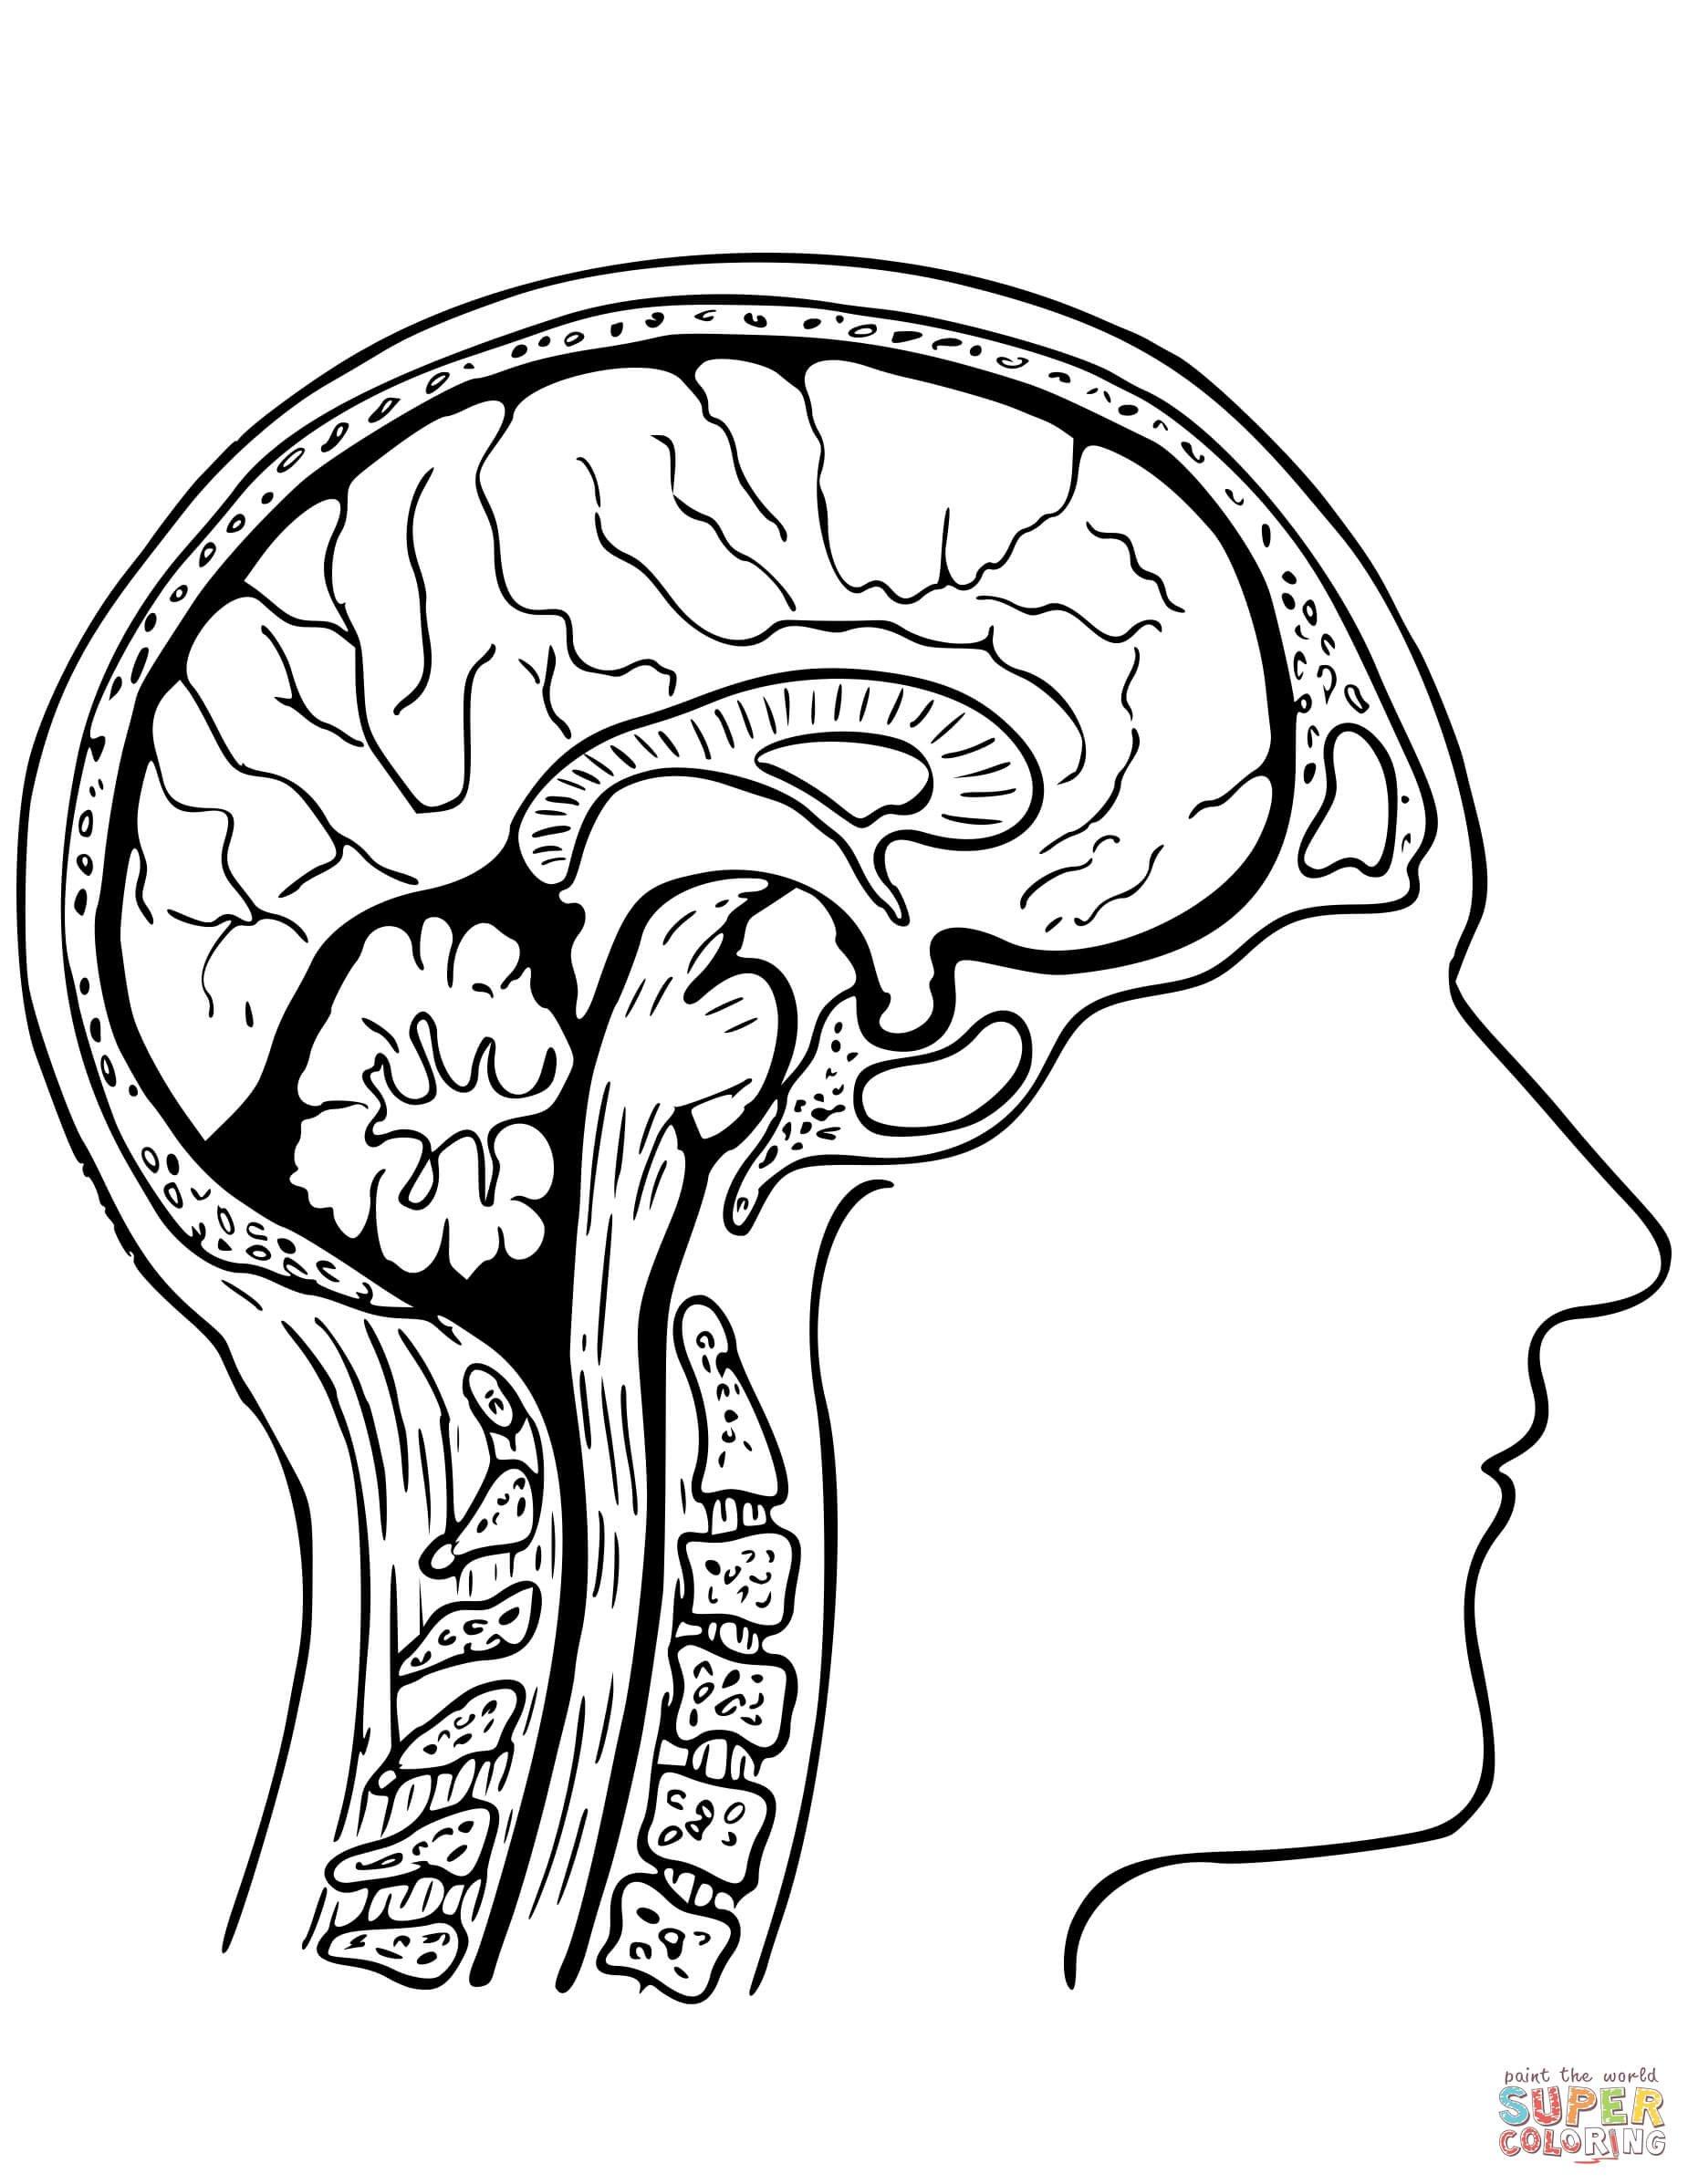 Human Brain Coloring Page  Free Printable Coloring Pages In Brain Coloring Worksheet